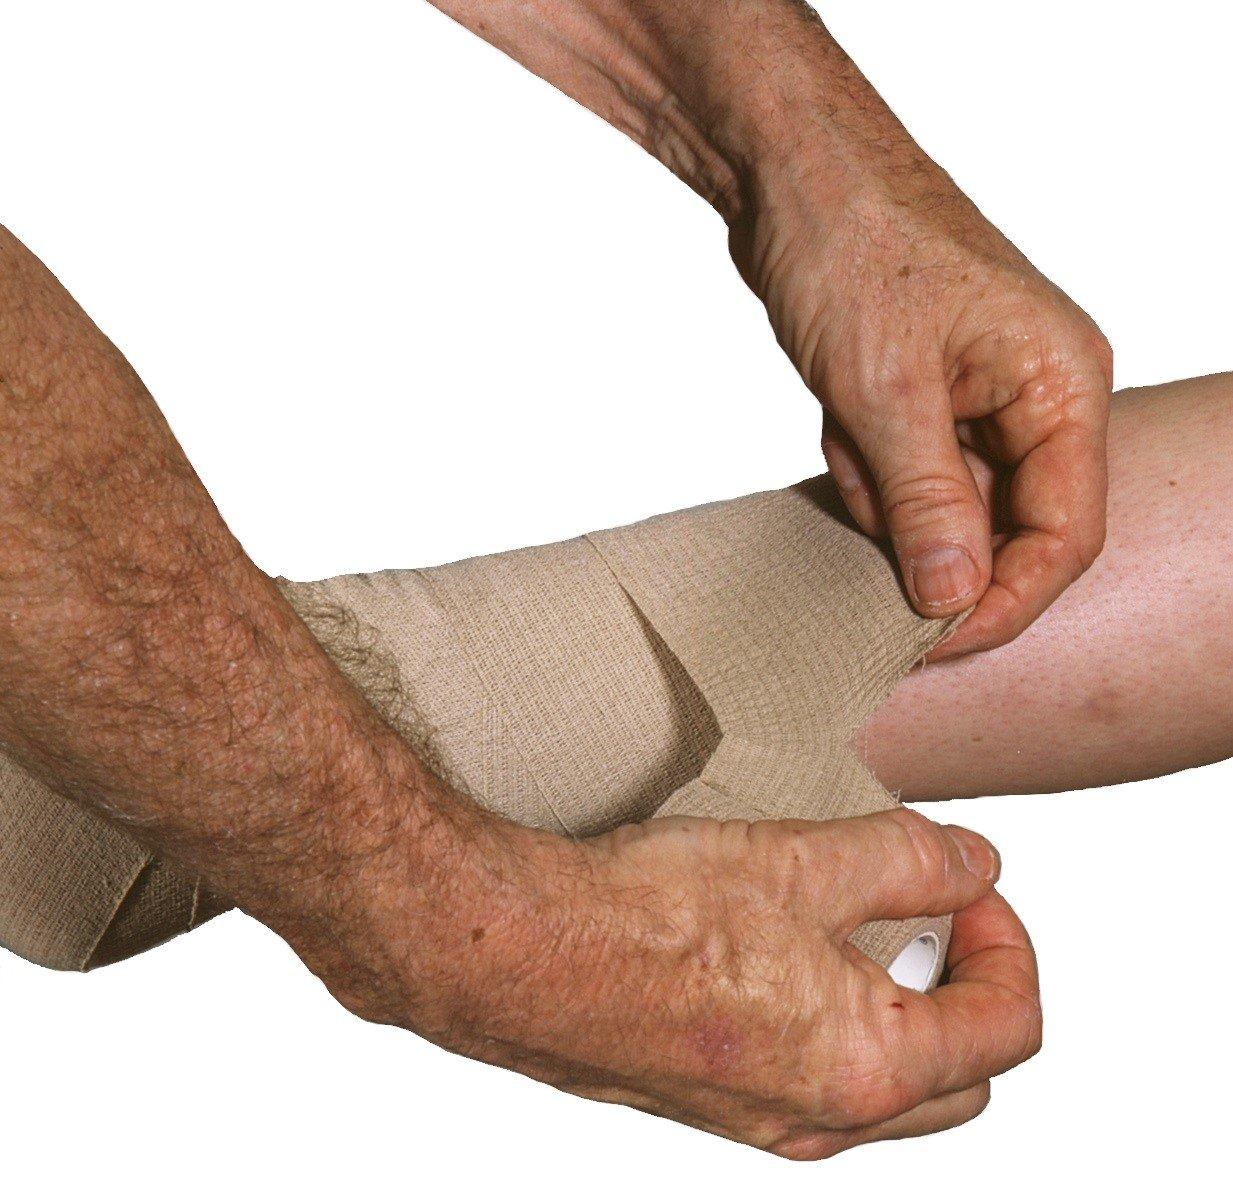 Medi-Rip LF Self-Adherent Bandage, Tan, 3 Inch x 5 Yards - 1/Box of 12